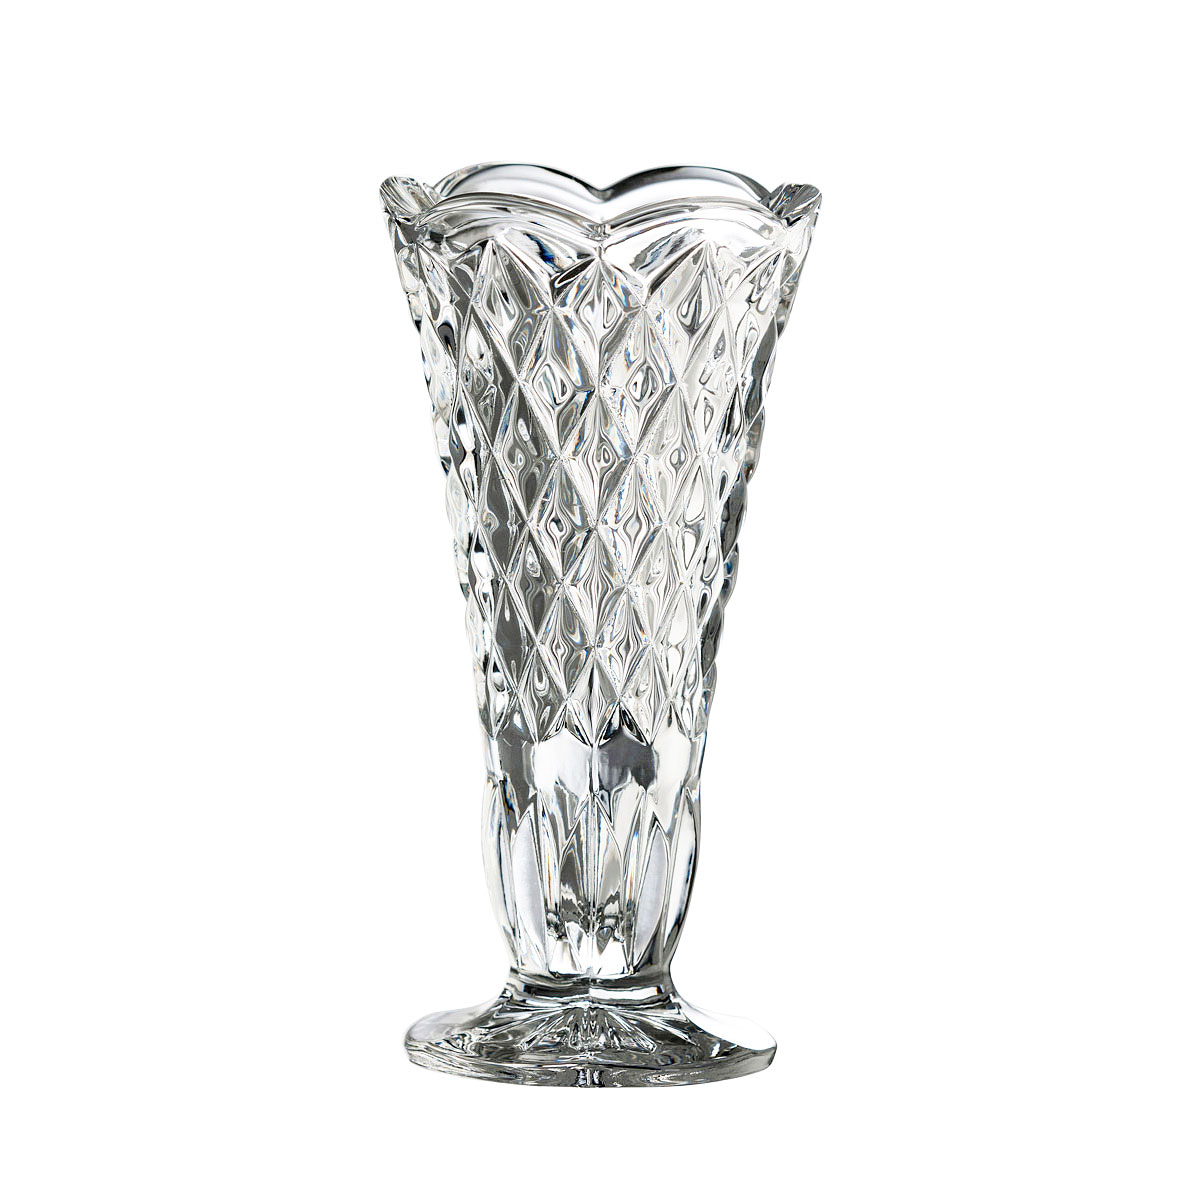 Galway Ashford Bud Vase